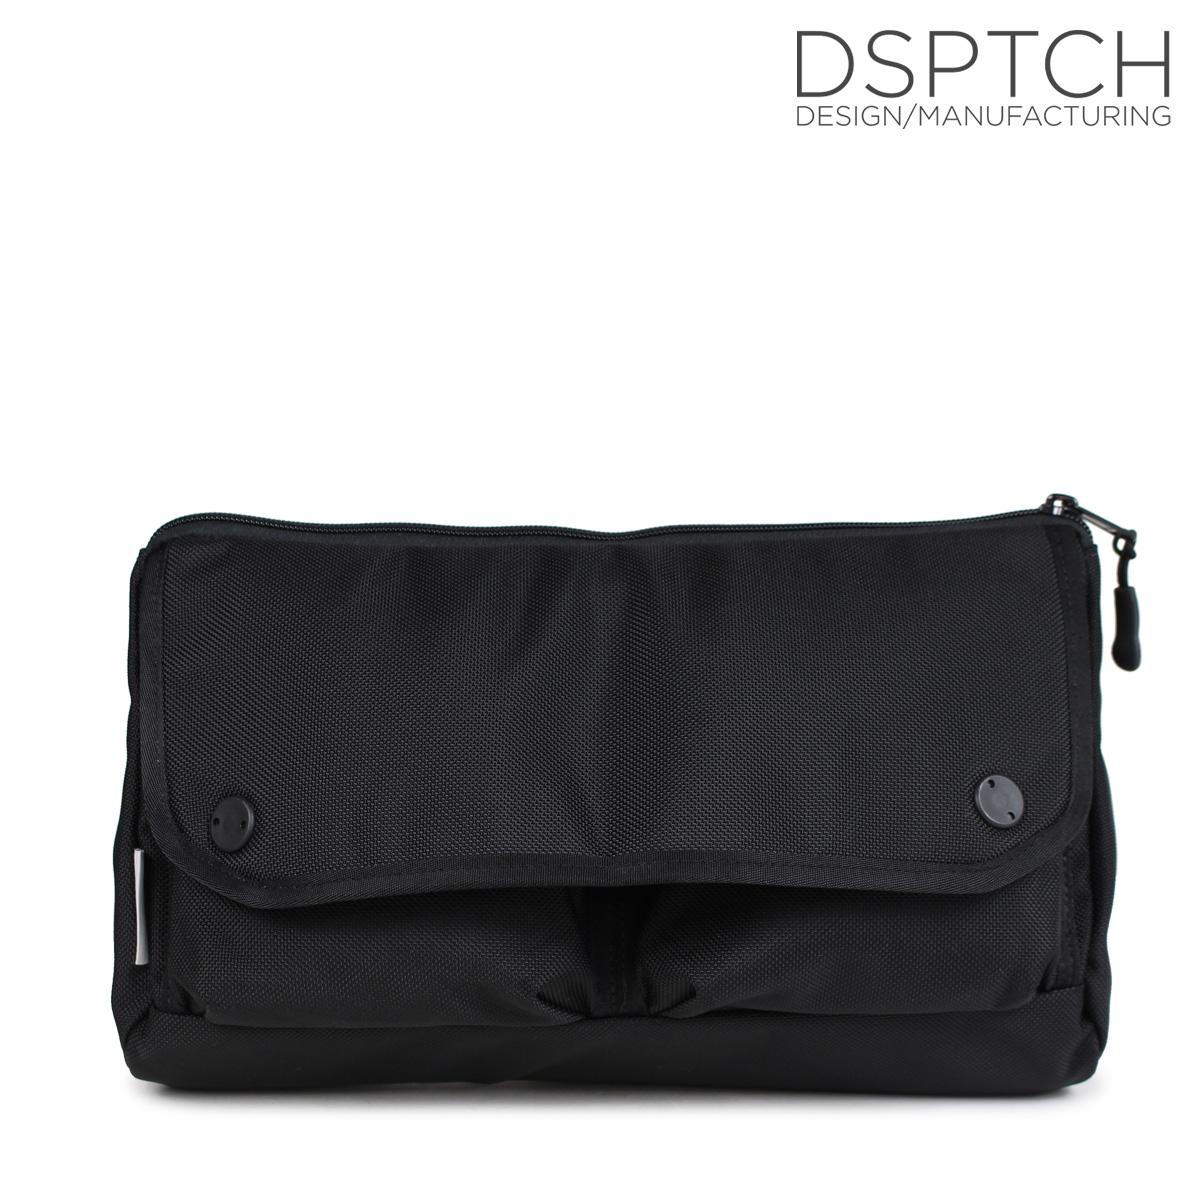 DSPTCH ディスパッチ バッグ ウエストバッグ ワンショルダー WAIST BAG 8L メンズ レディース ブラック PCK-WB [10/9 新入荷]